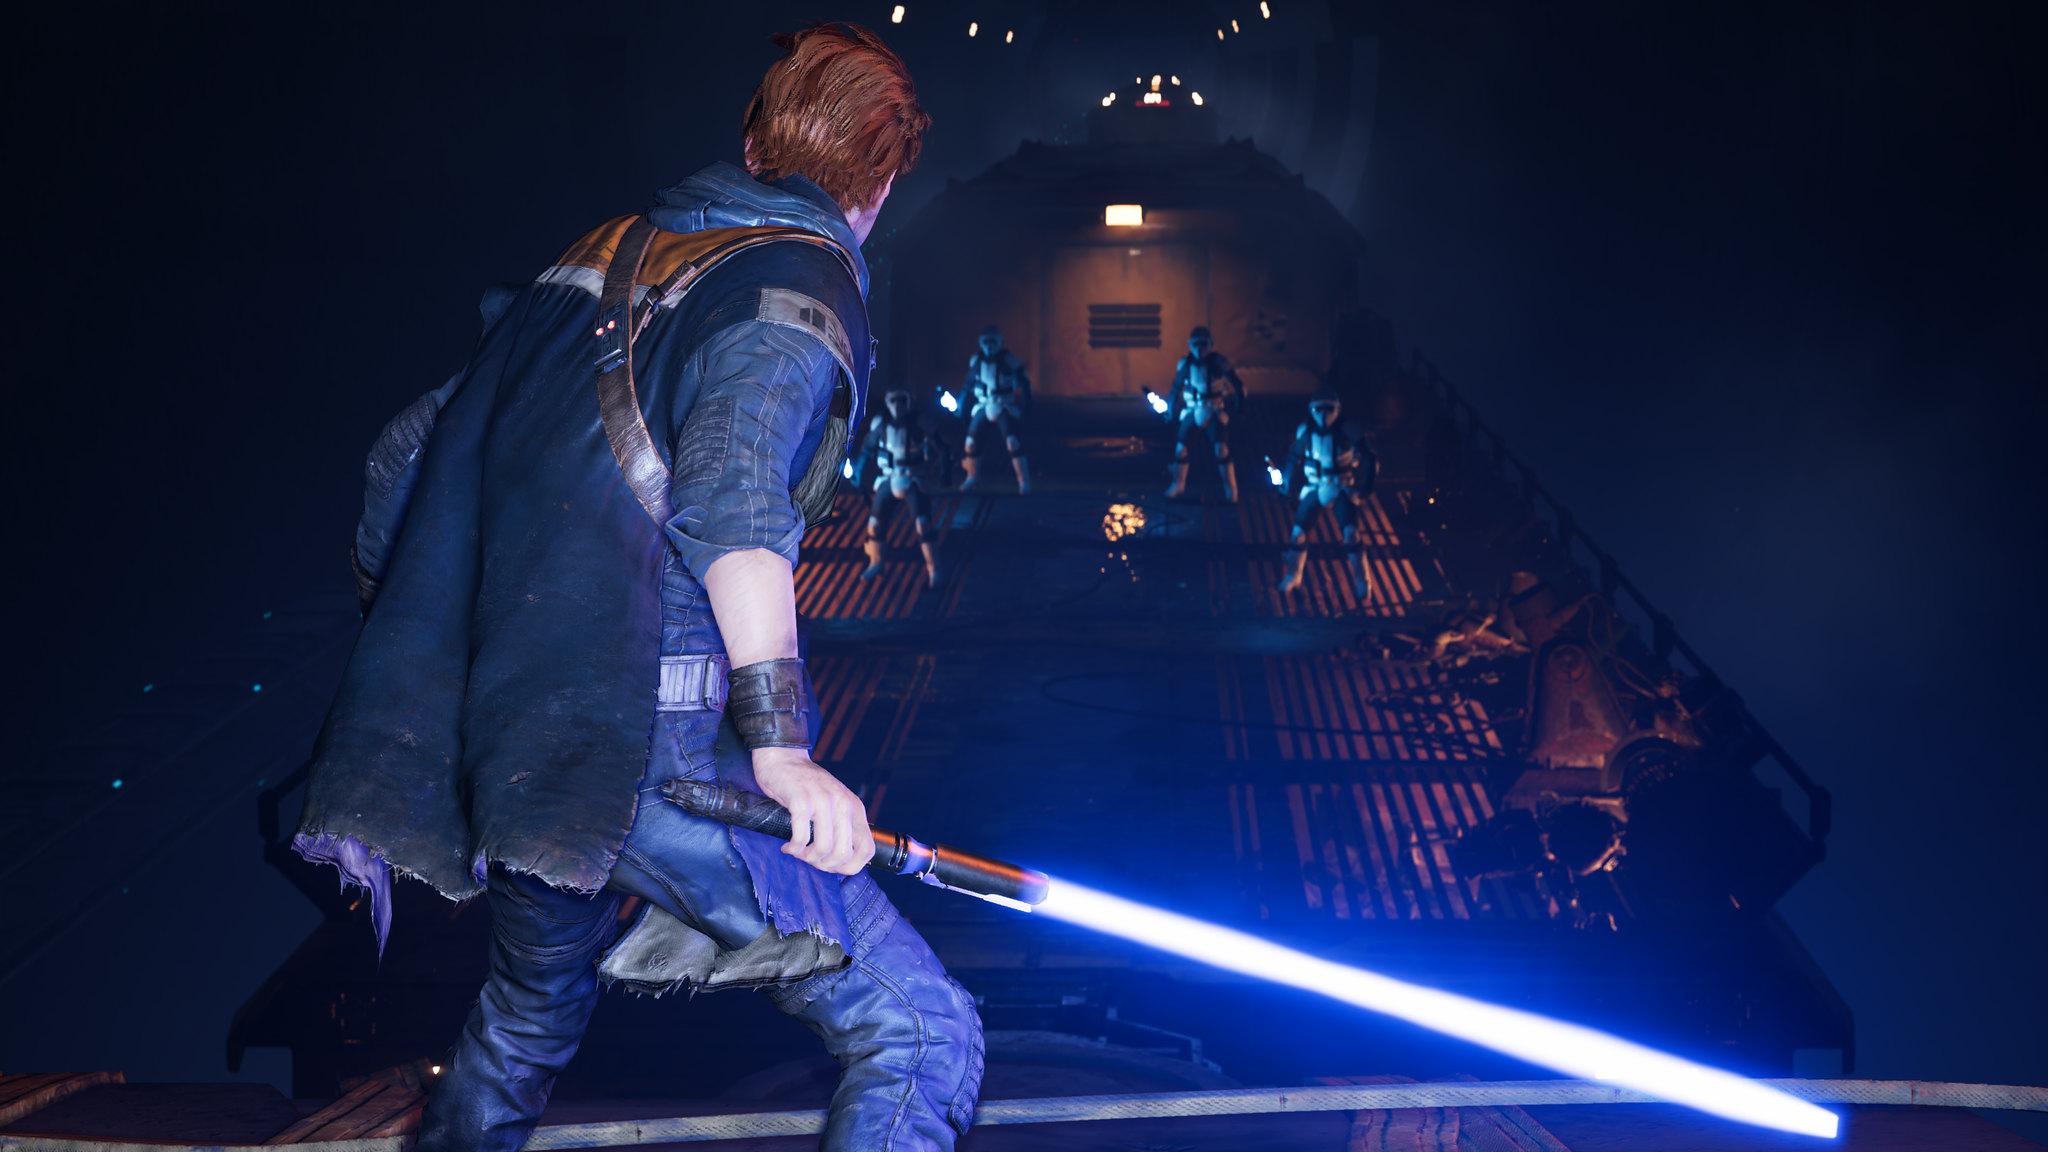 49085821621_a89edebd67_k.jpg - Star Wars Jedi: Fallen Order